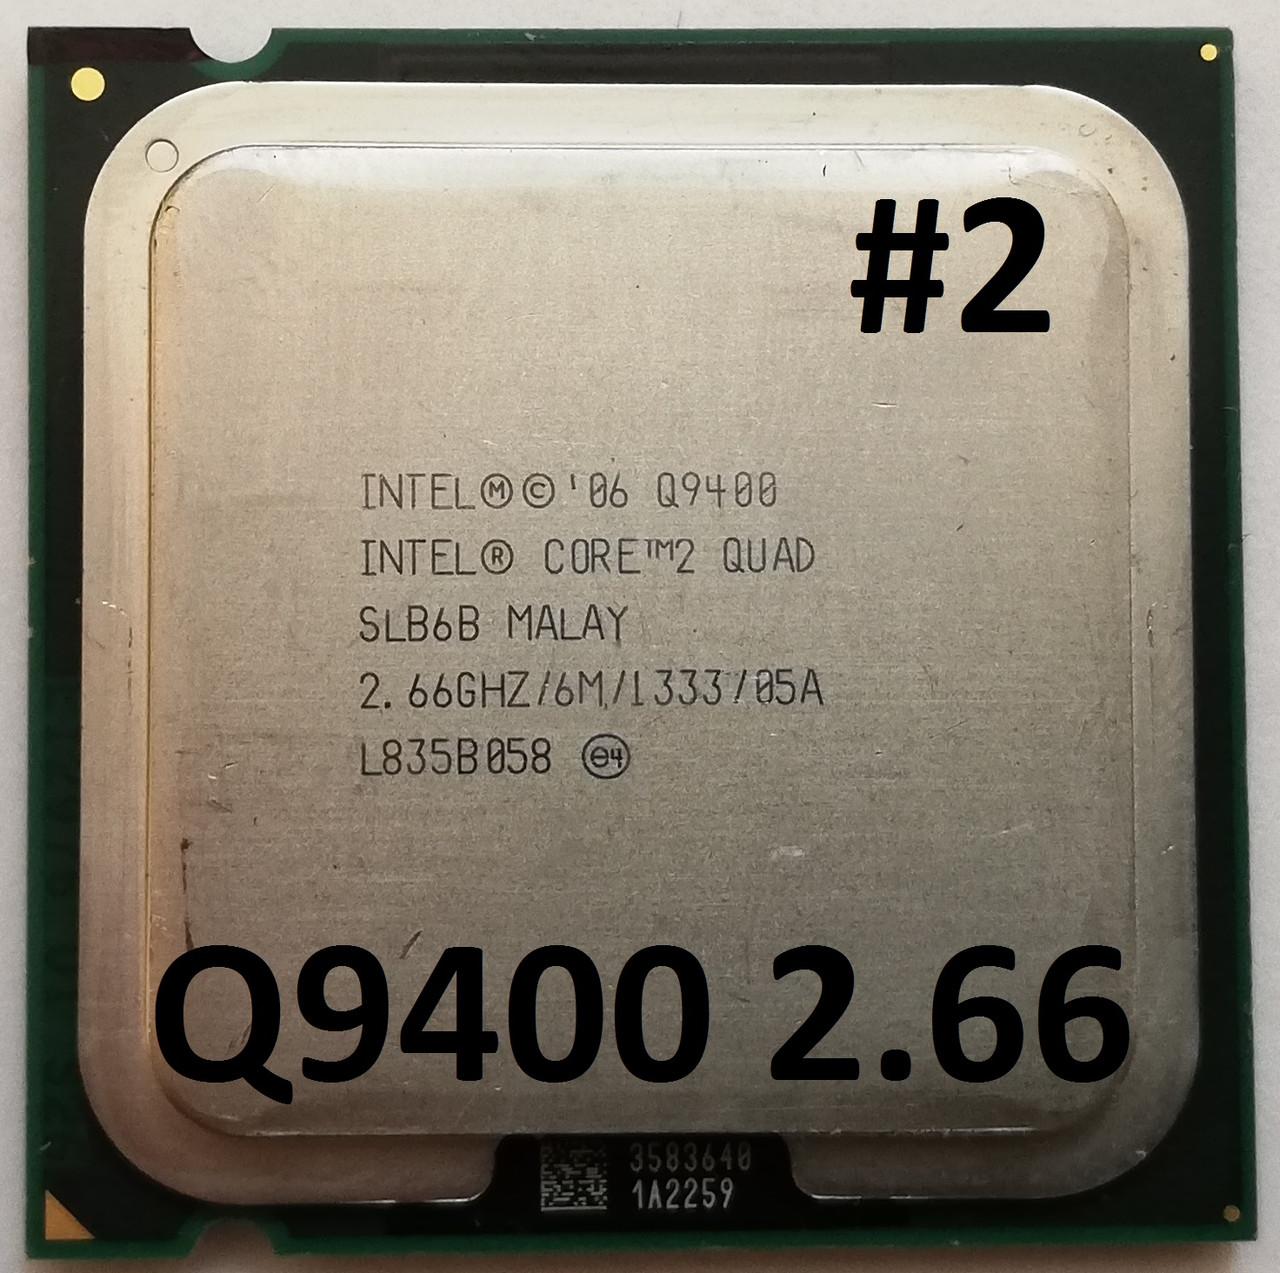 Процессор  ЛОТ #2 Intel® Core™2 Quad Q9400 R0 SLB6B 2.66GHz 6M Cache 1333 MHz FSB Soket 775 Б/У